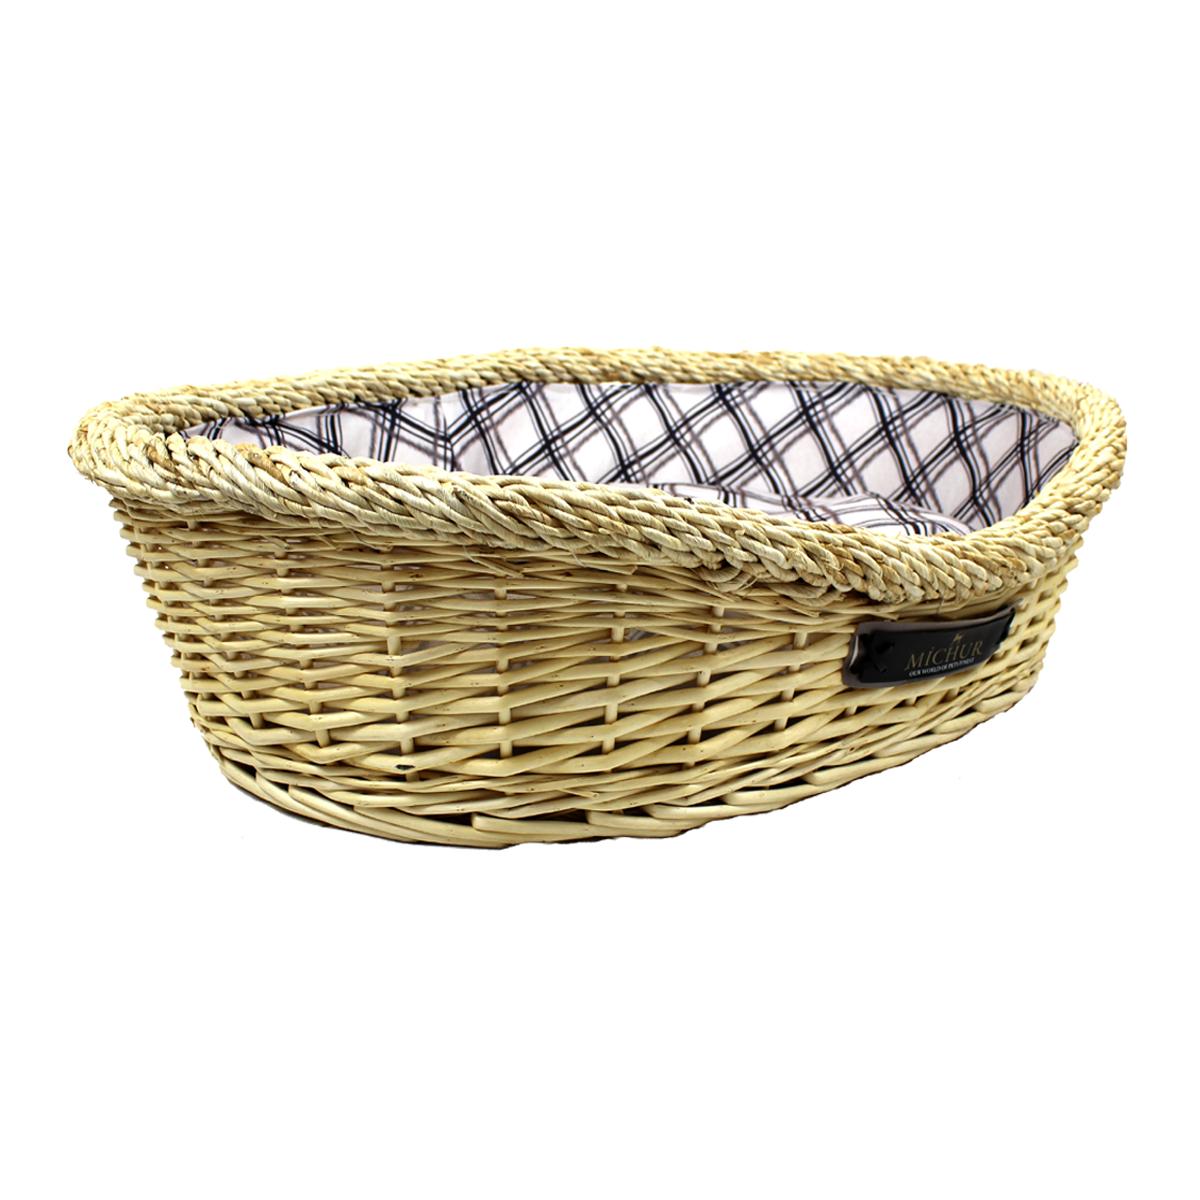 Handmade Wicker Dog Basket : Michur lotte dog cat basket cave bed rattan willow